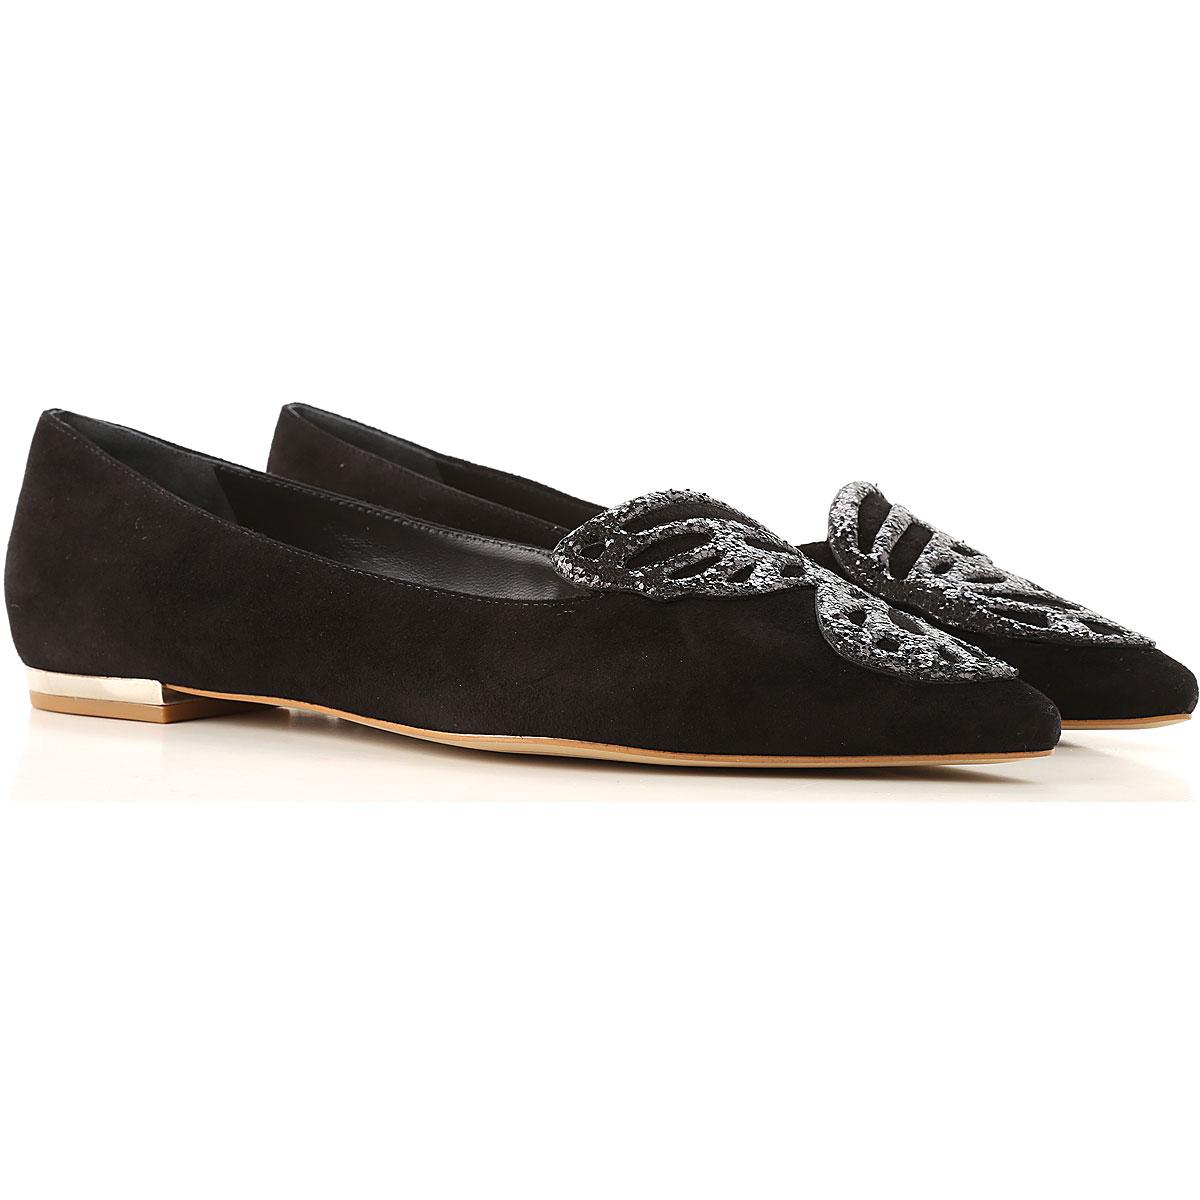 Image of Sophia Webster Ballet Flats Ballerina Shoes for Women, Black, Suede leather, 2017, 5 5.5 7 8 8.5